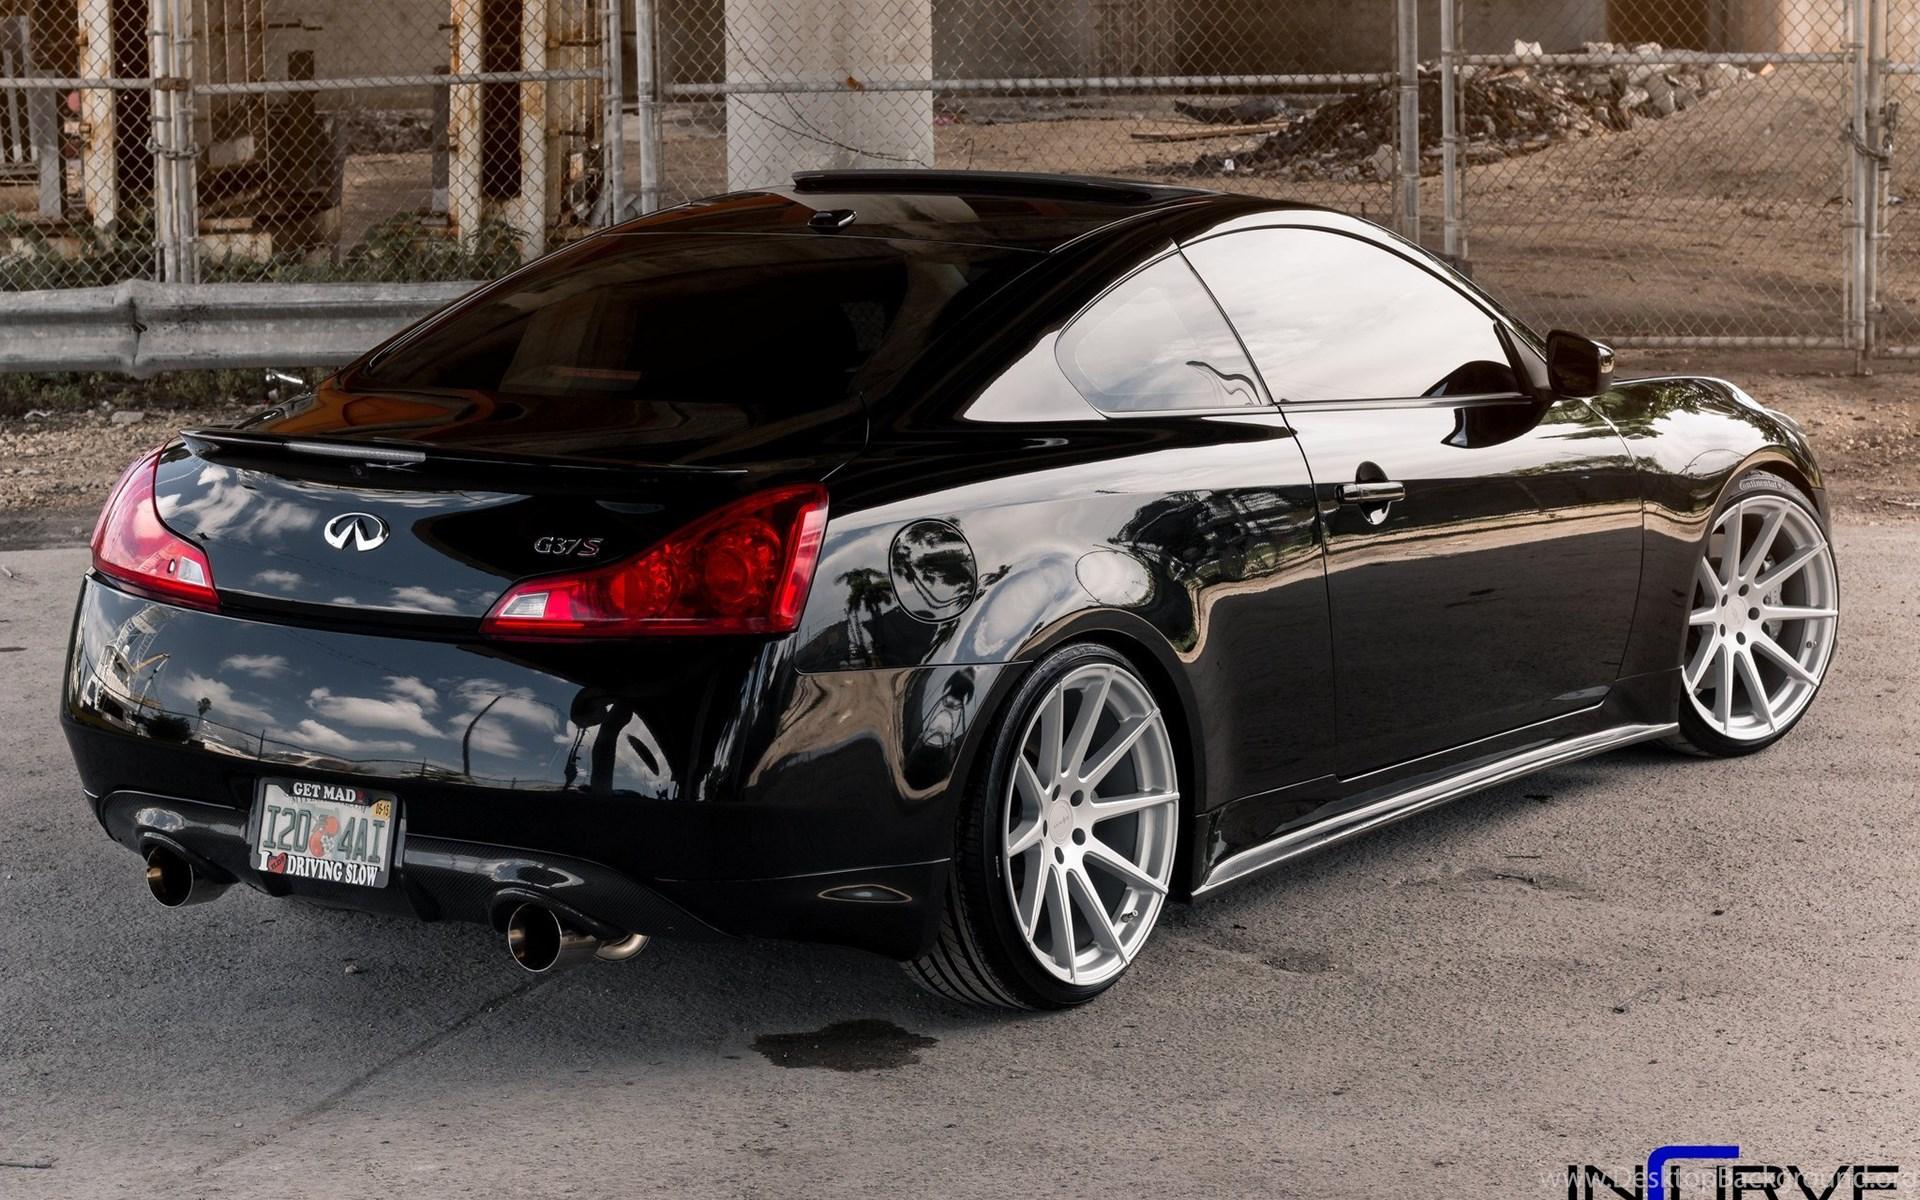 2015 Incurve Wheels Cars Tuning Infiniti G37 Wallpapers Desktop Widescreen